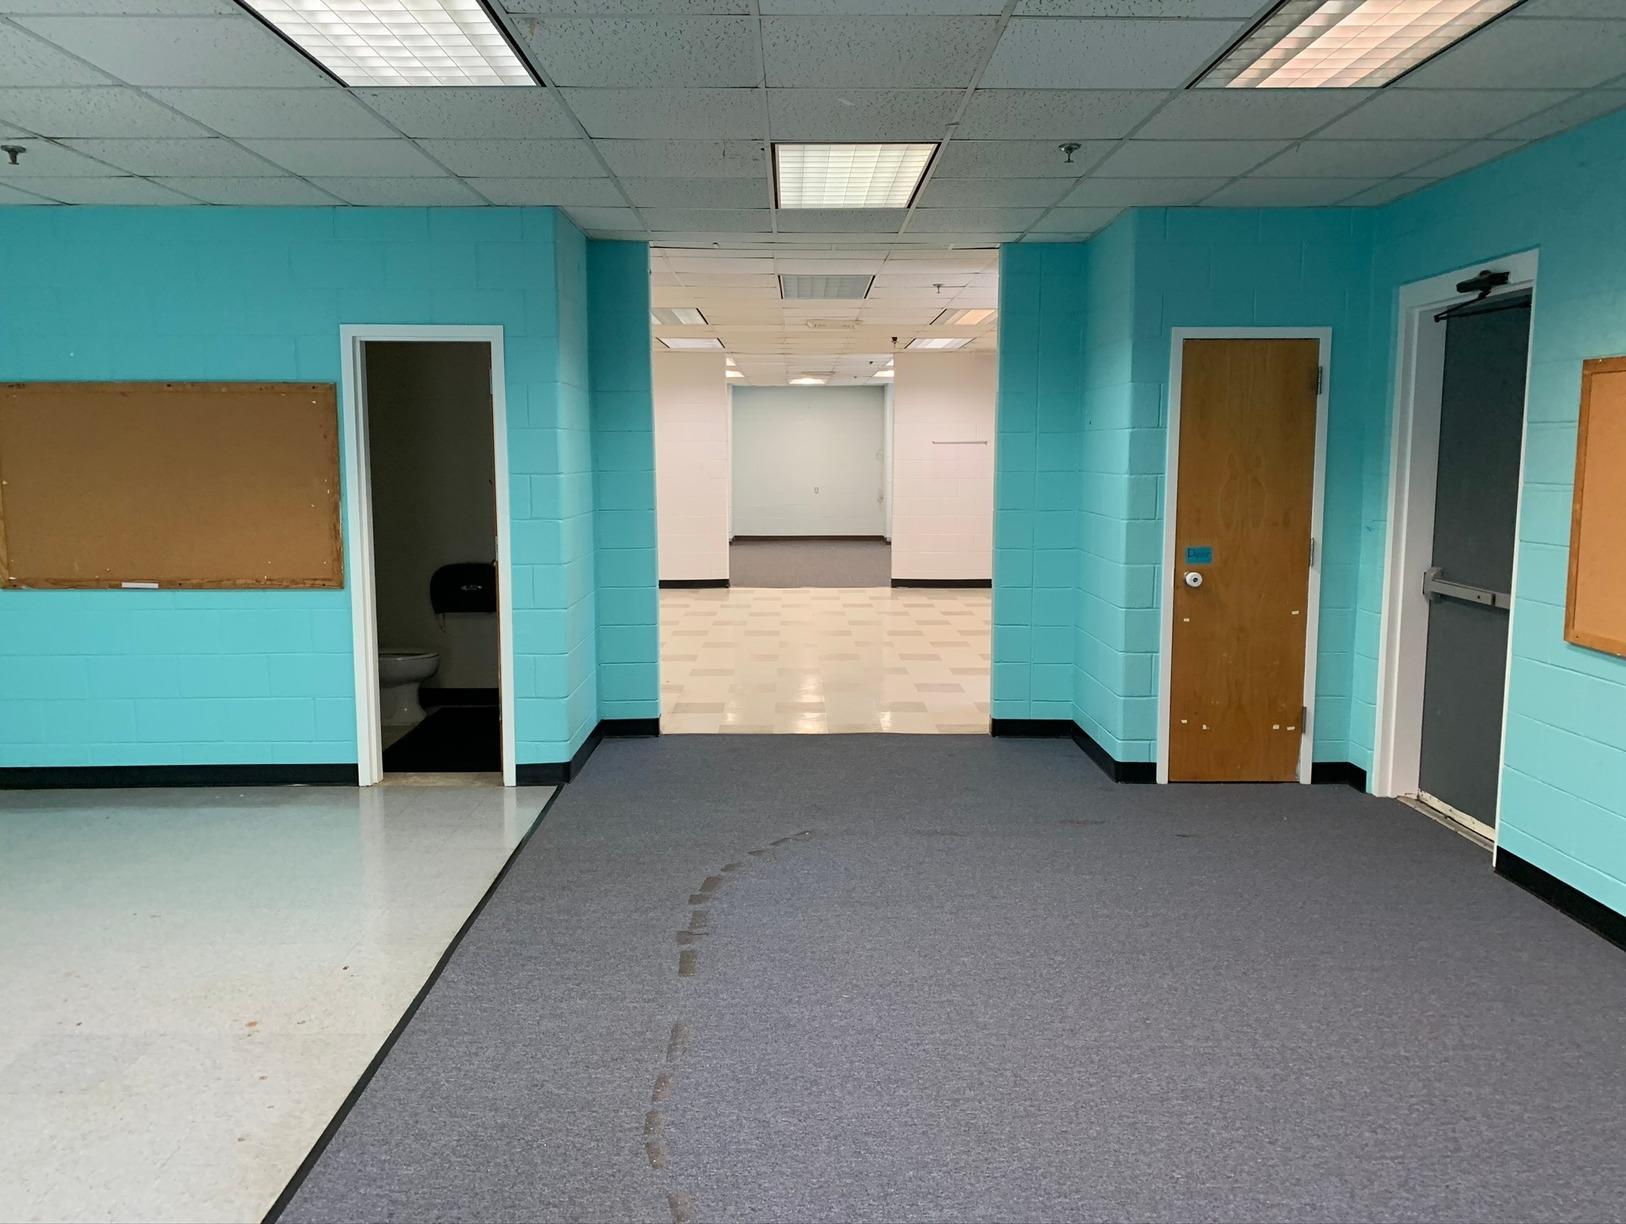 Preschool Furniture Removal in Williamsburg, VA - After Photo